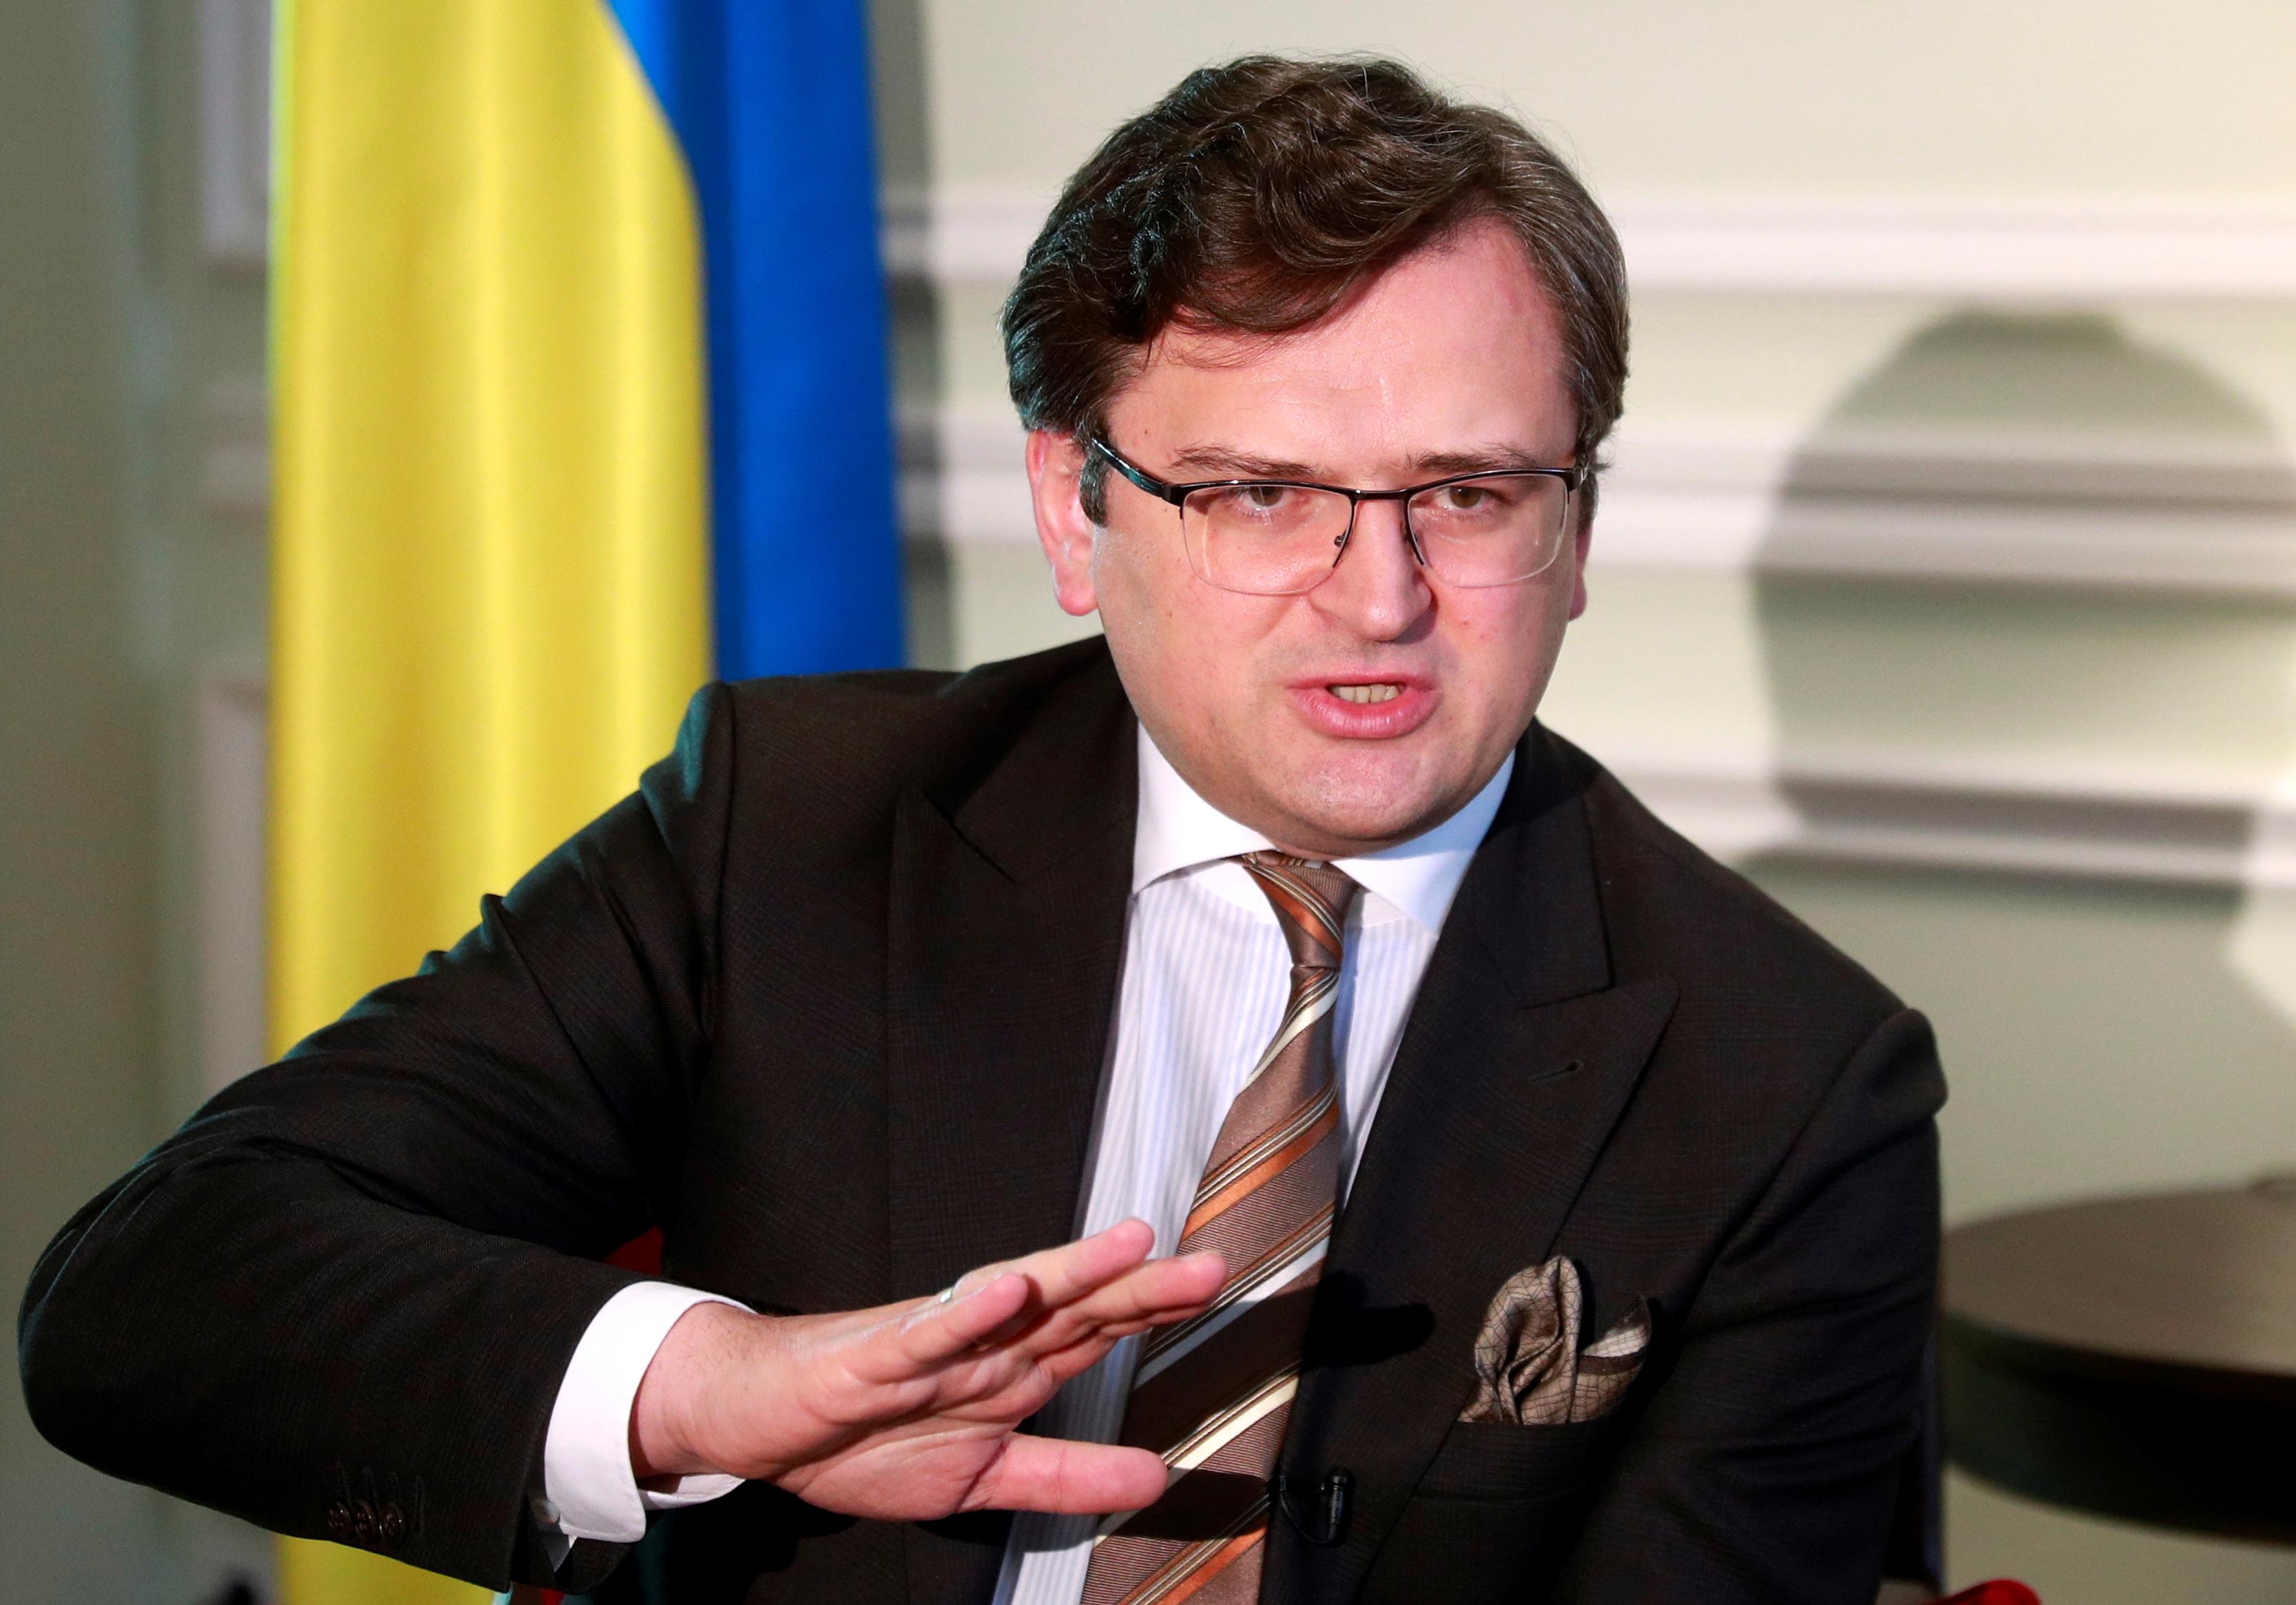 Ukraine's Foreign Minister Dmytro Kuleba speaks during an interview with Reuters in Kyiv, Ukraine April 21, 2021.  REUTERS/Valentyn Ogirenko